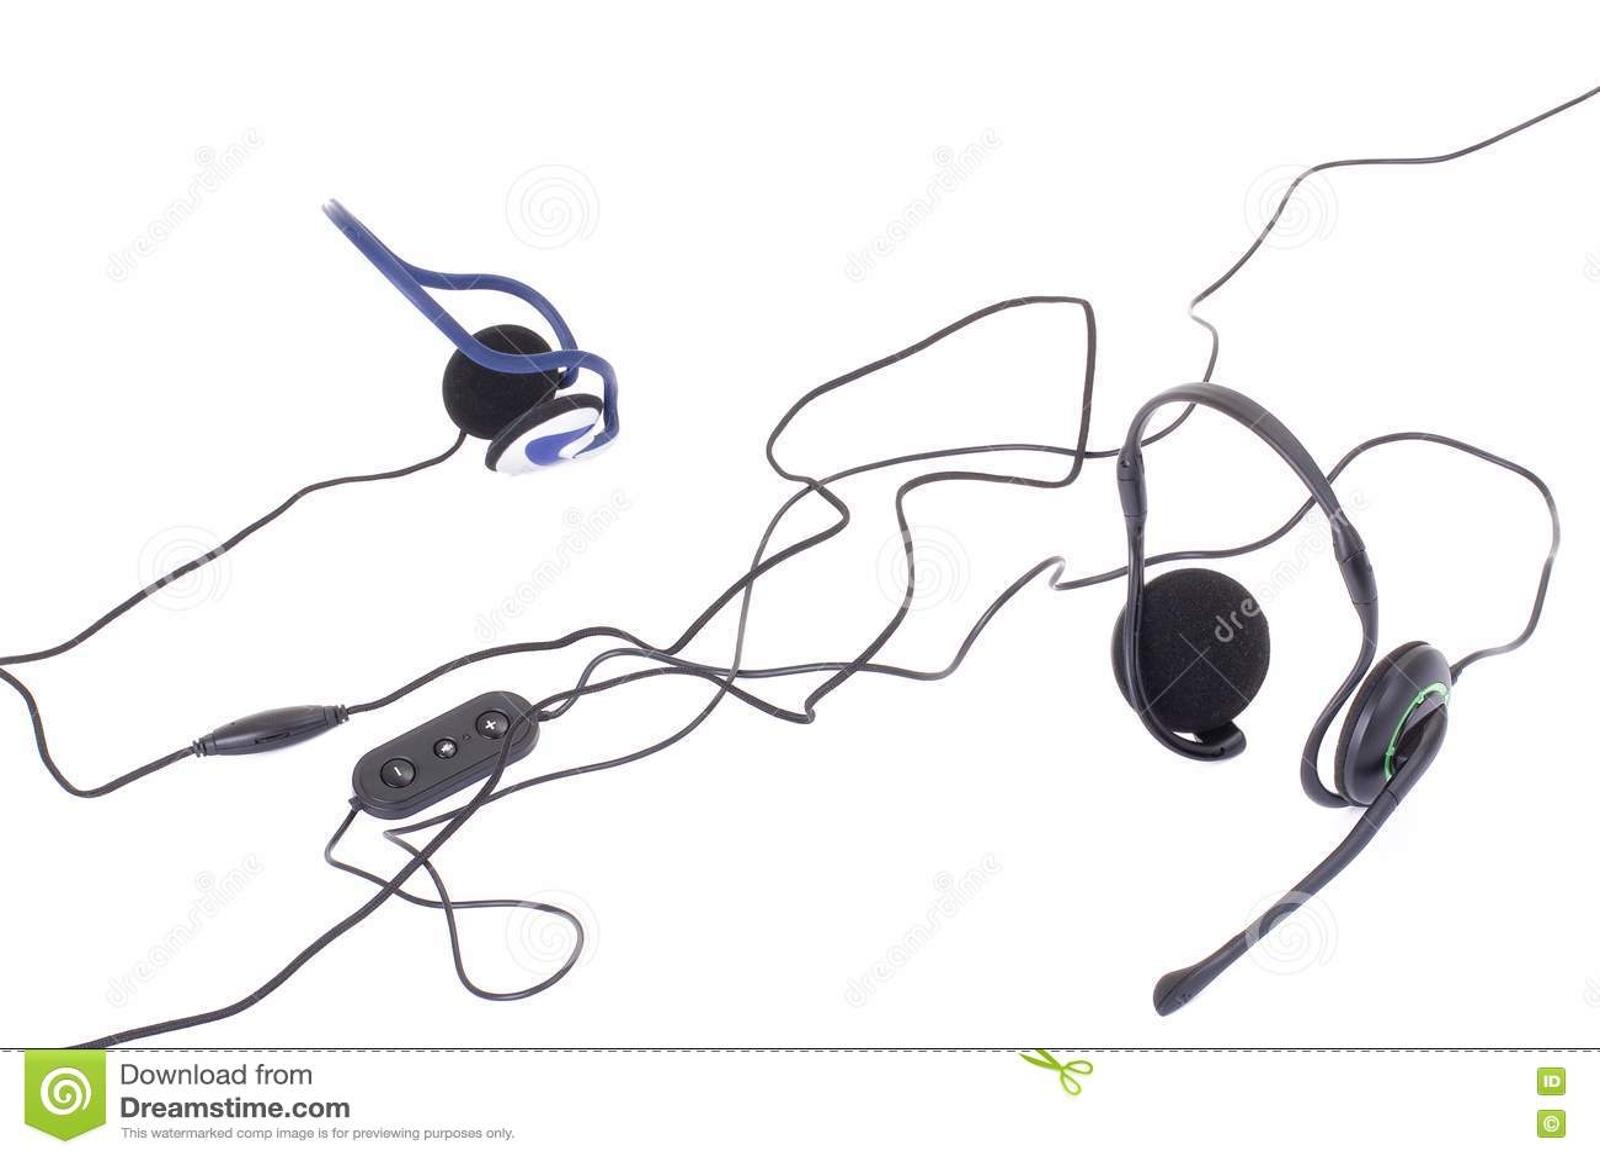 Black Headphones Isolated On White Background Stock Photo